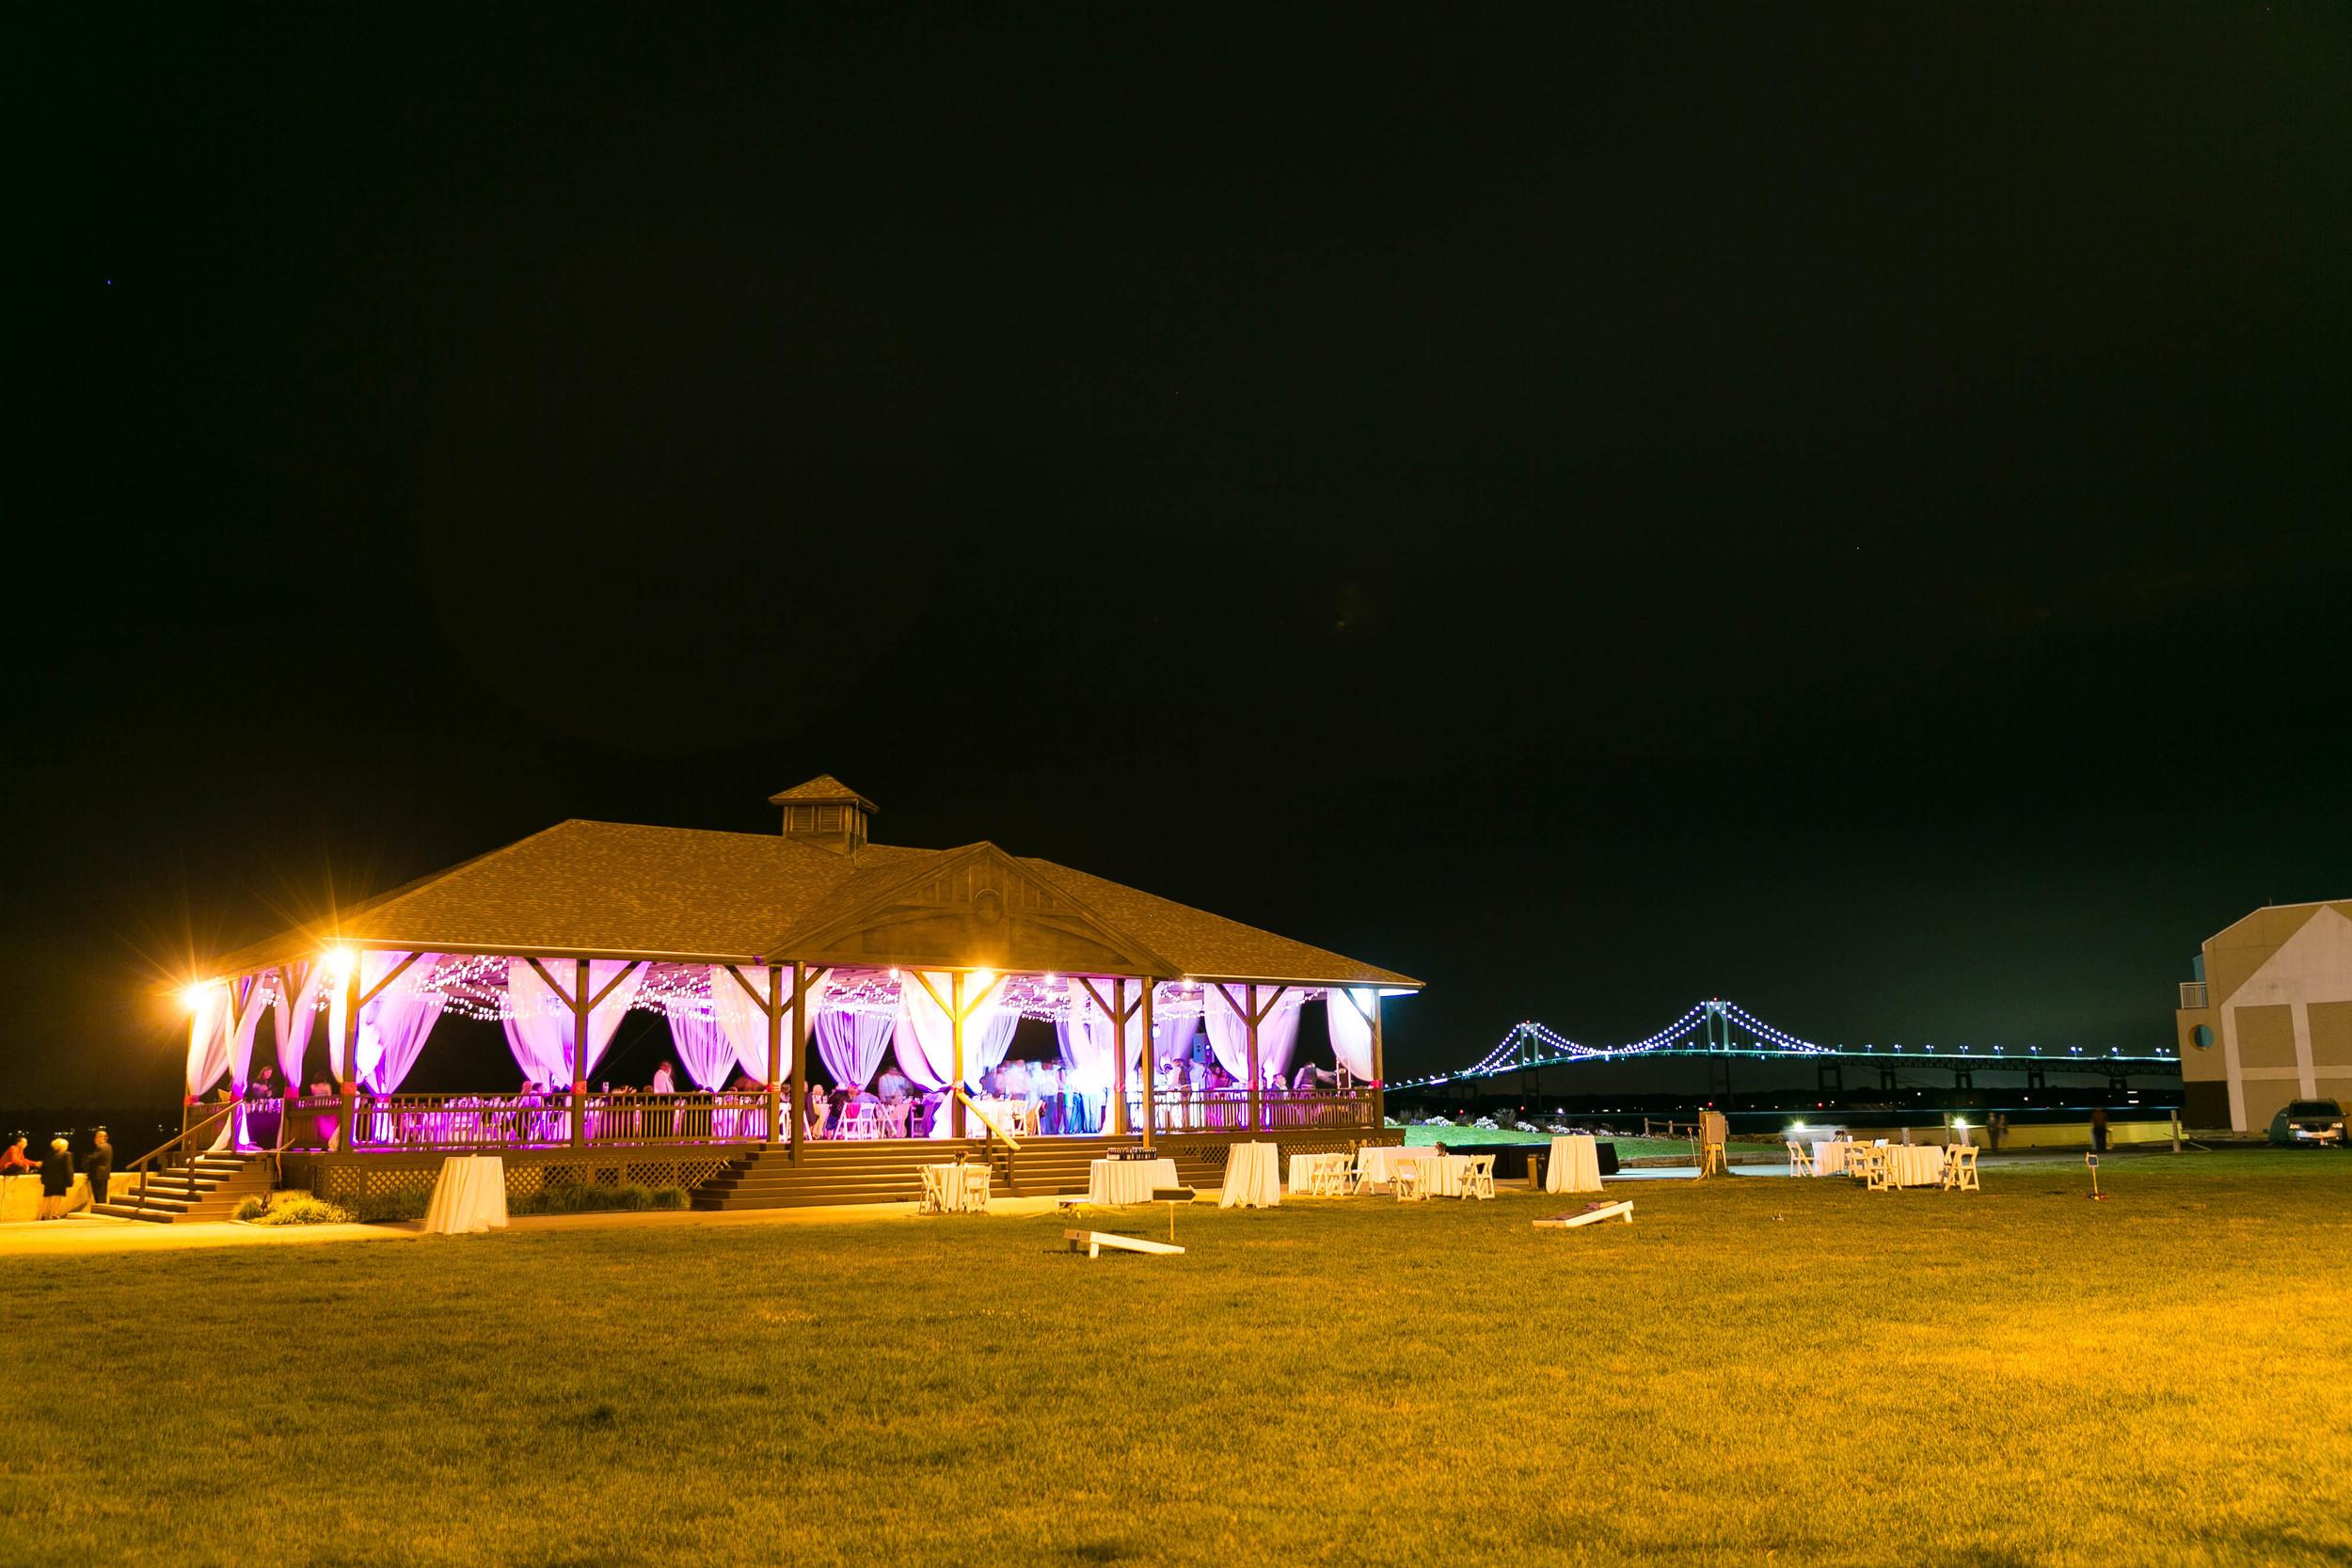 Romantic-Newport-Ri-Wedding-Hyatt-Goat-Island-Documentary-Wedding-Photography-Jacek-Dolata-16.jpg